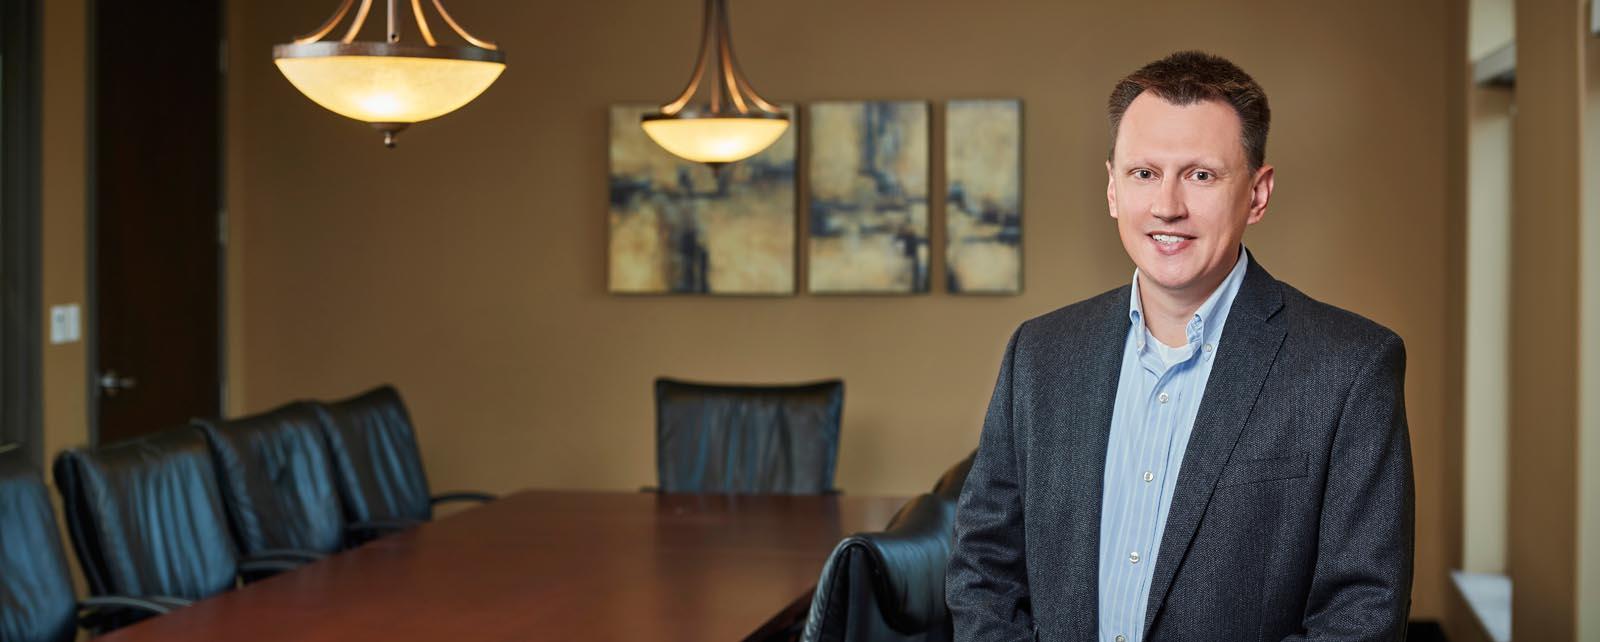 Rob_Storoschuk Millards Chartered Professional Accountants